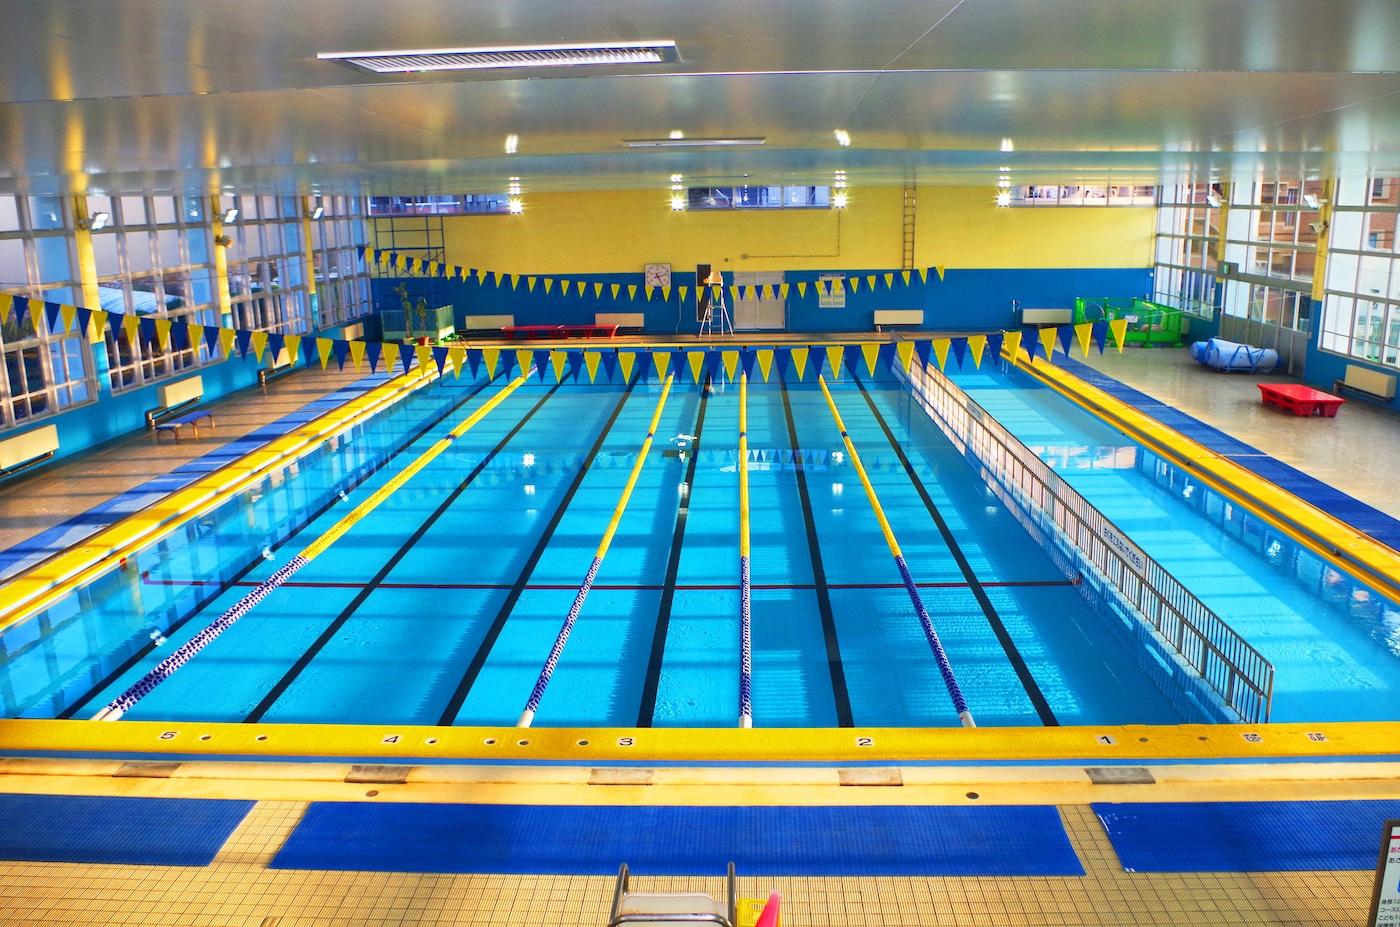 Indoor public pool  Fukuoka Public Pool Guide | Fukuoka Now